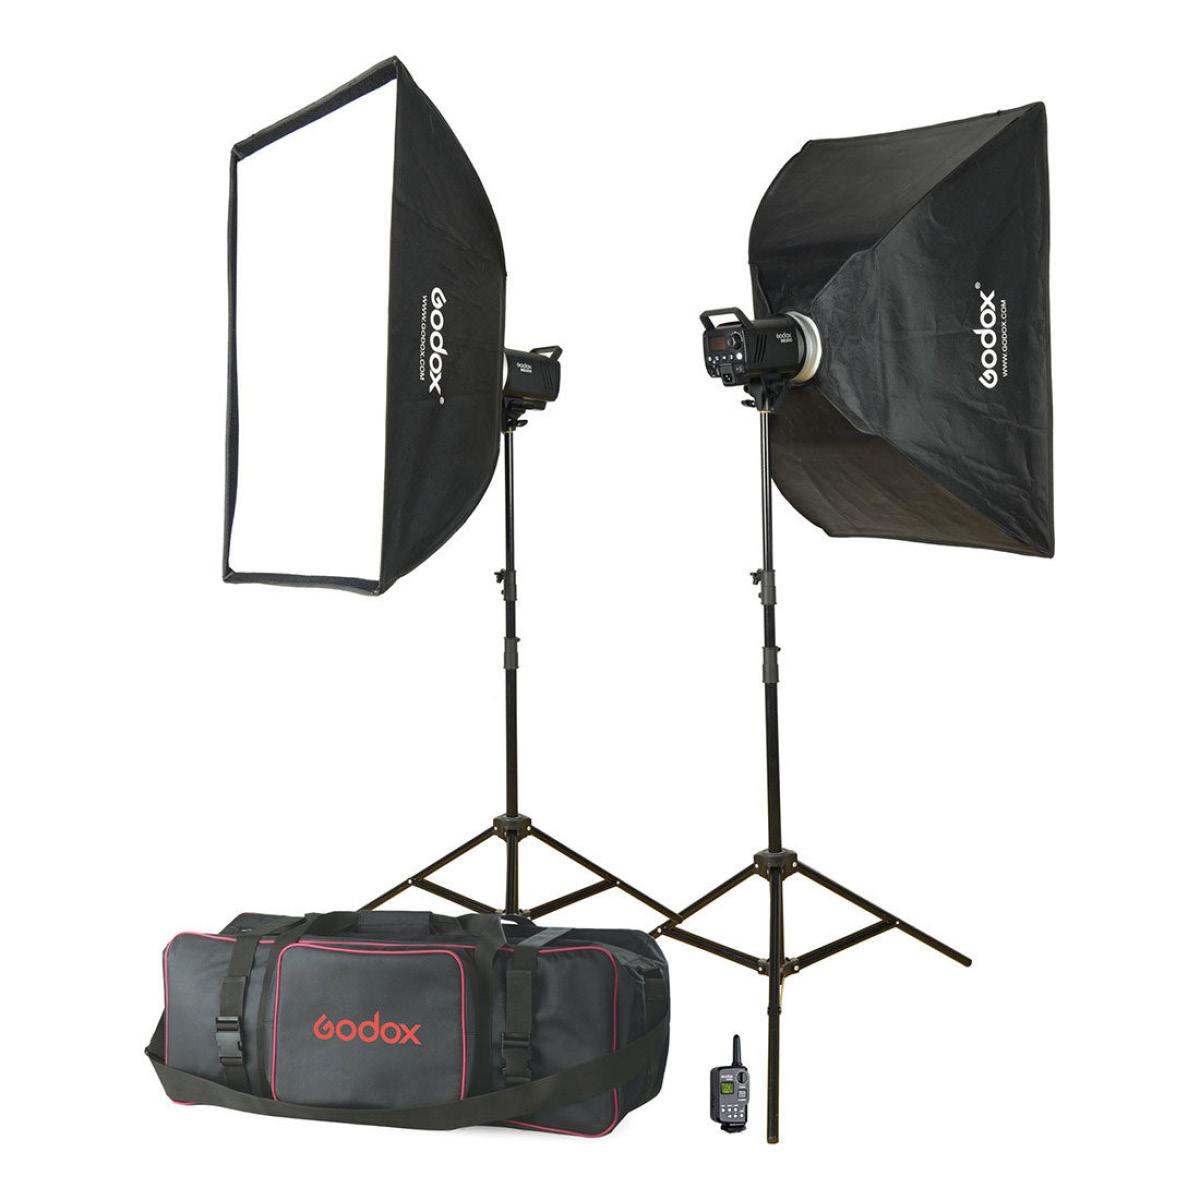 Godox MS200 F Studioblitz-Kit